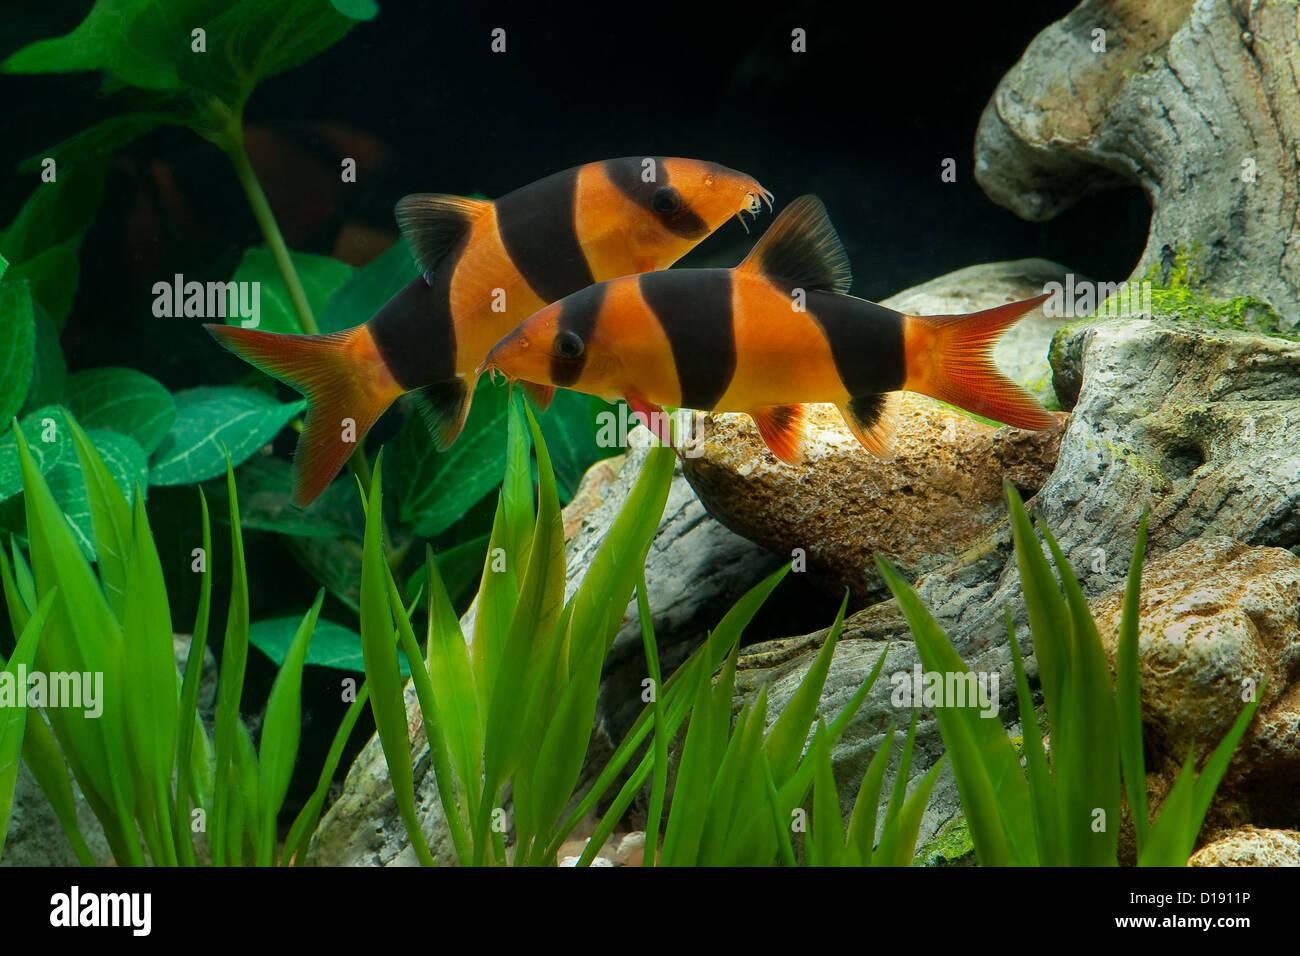 Two beautiful clown loaches in a home aquarium. - Stock Image